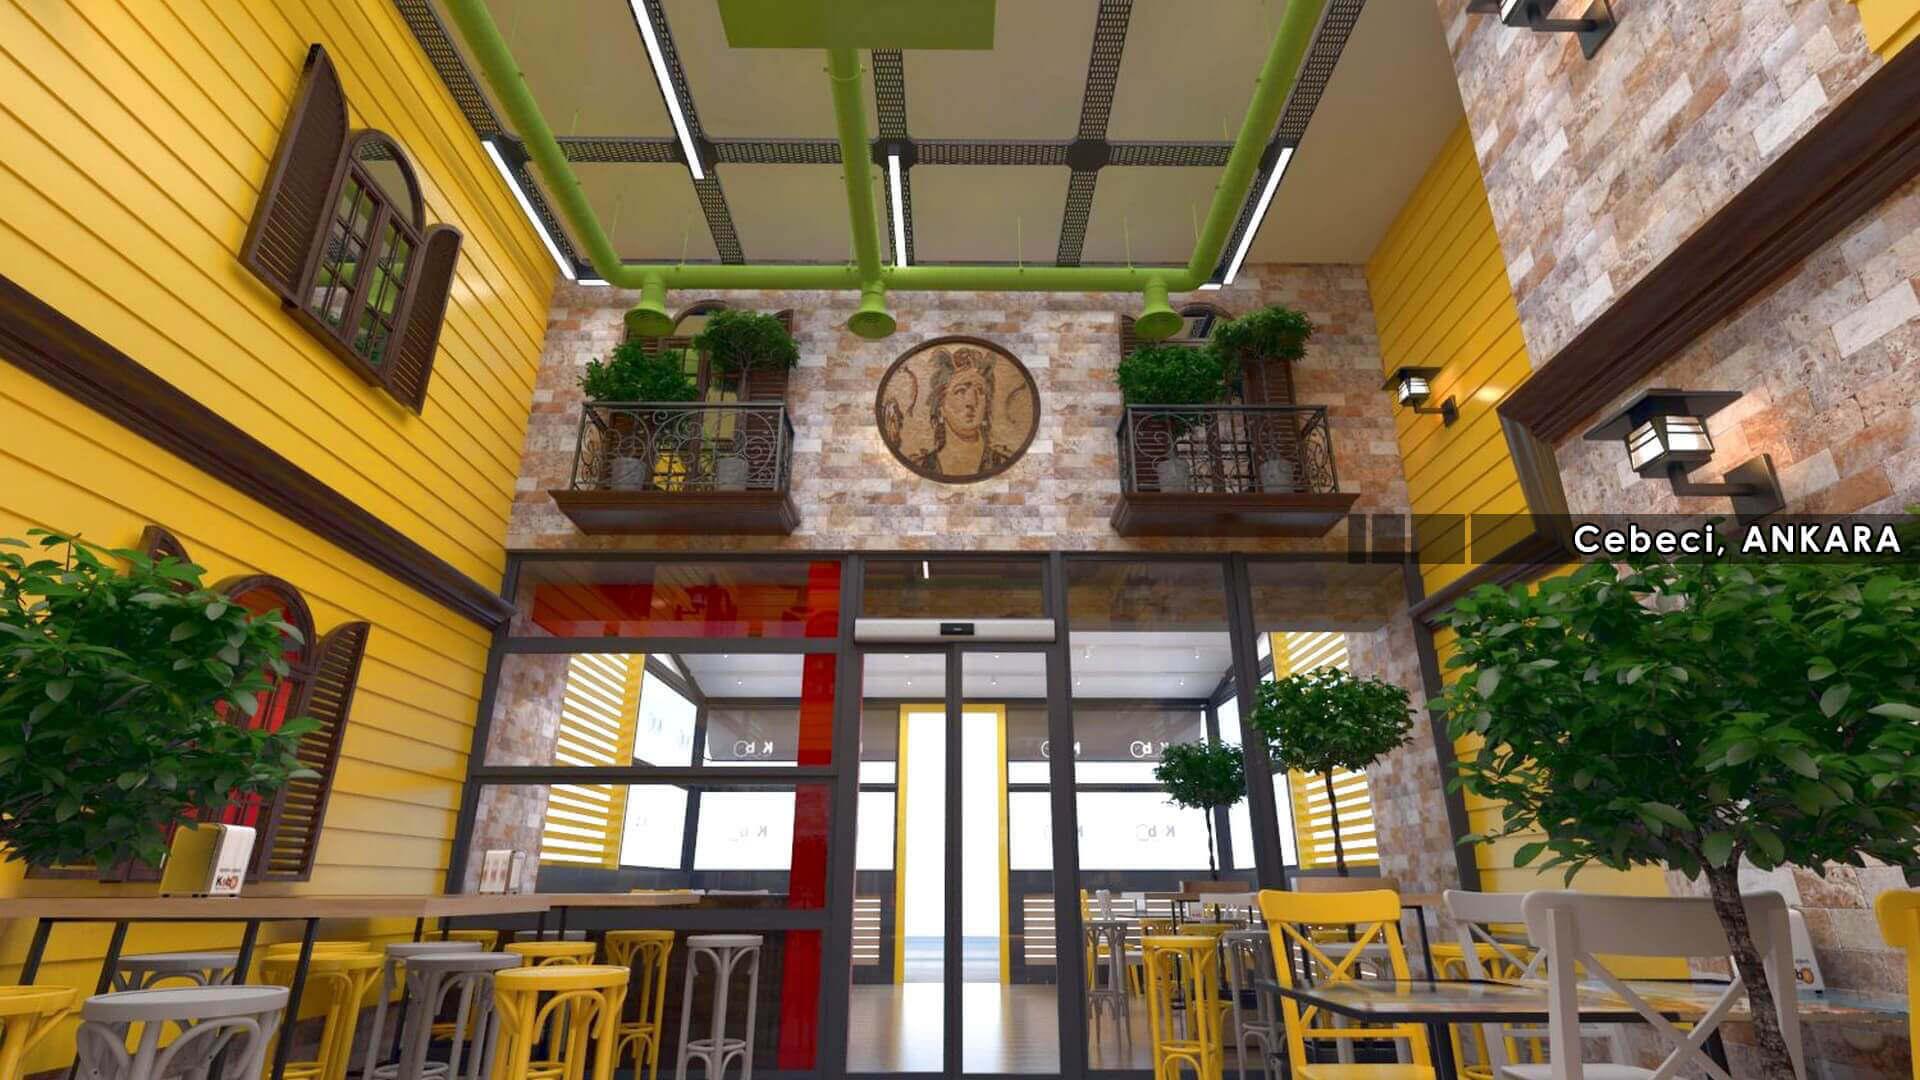 restorant iç mimar 2130 Kebo 2018 Restoranlar